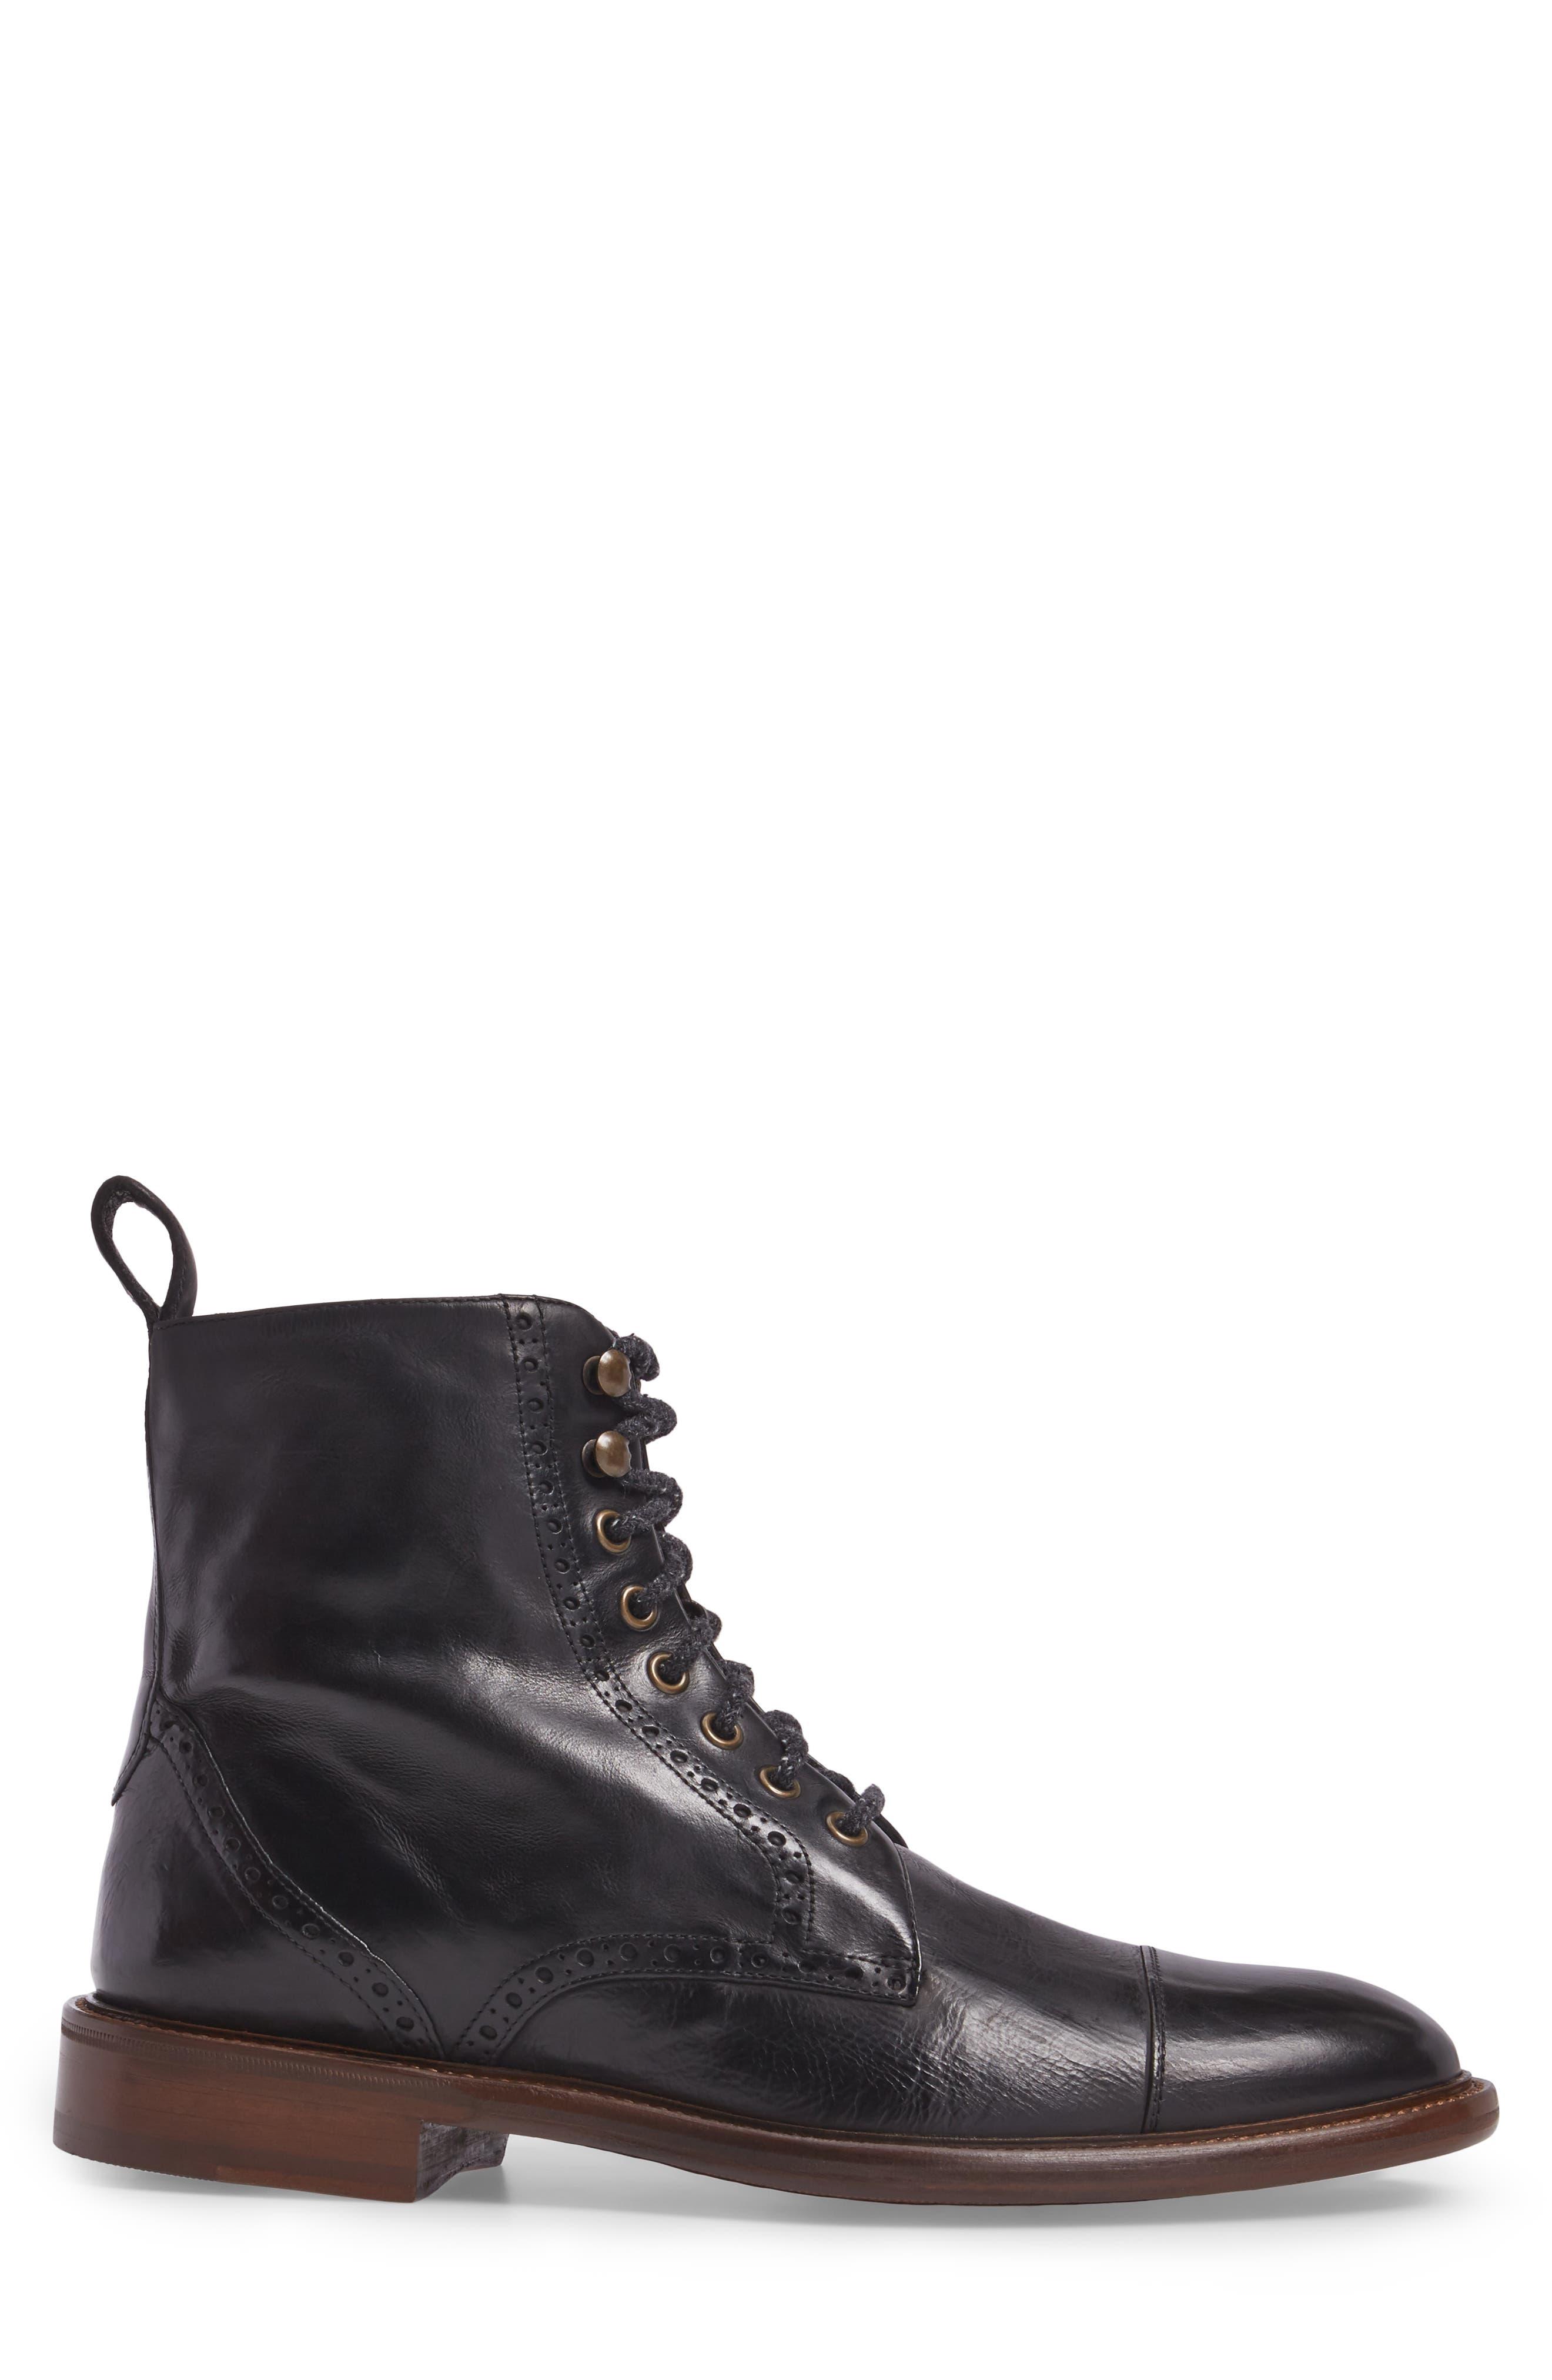 Alternate Image 3  - J&M 1850 Bryson Cap Toe Boot (Men)